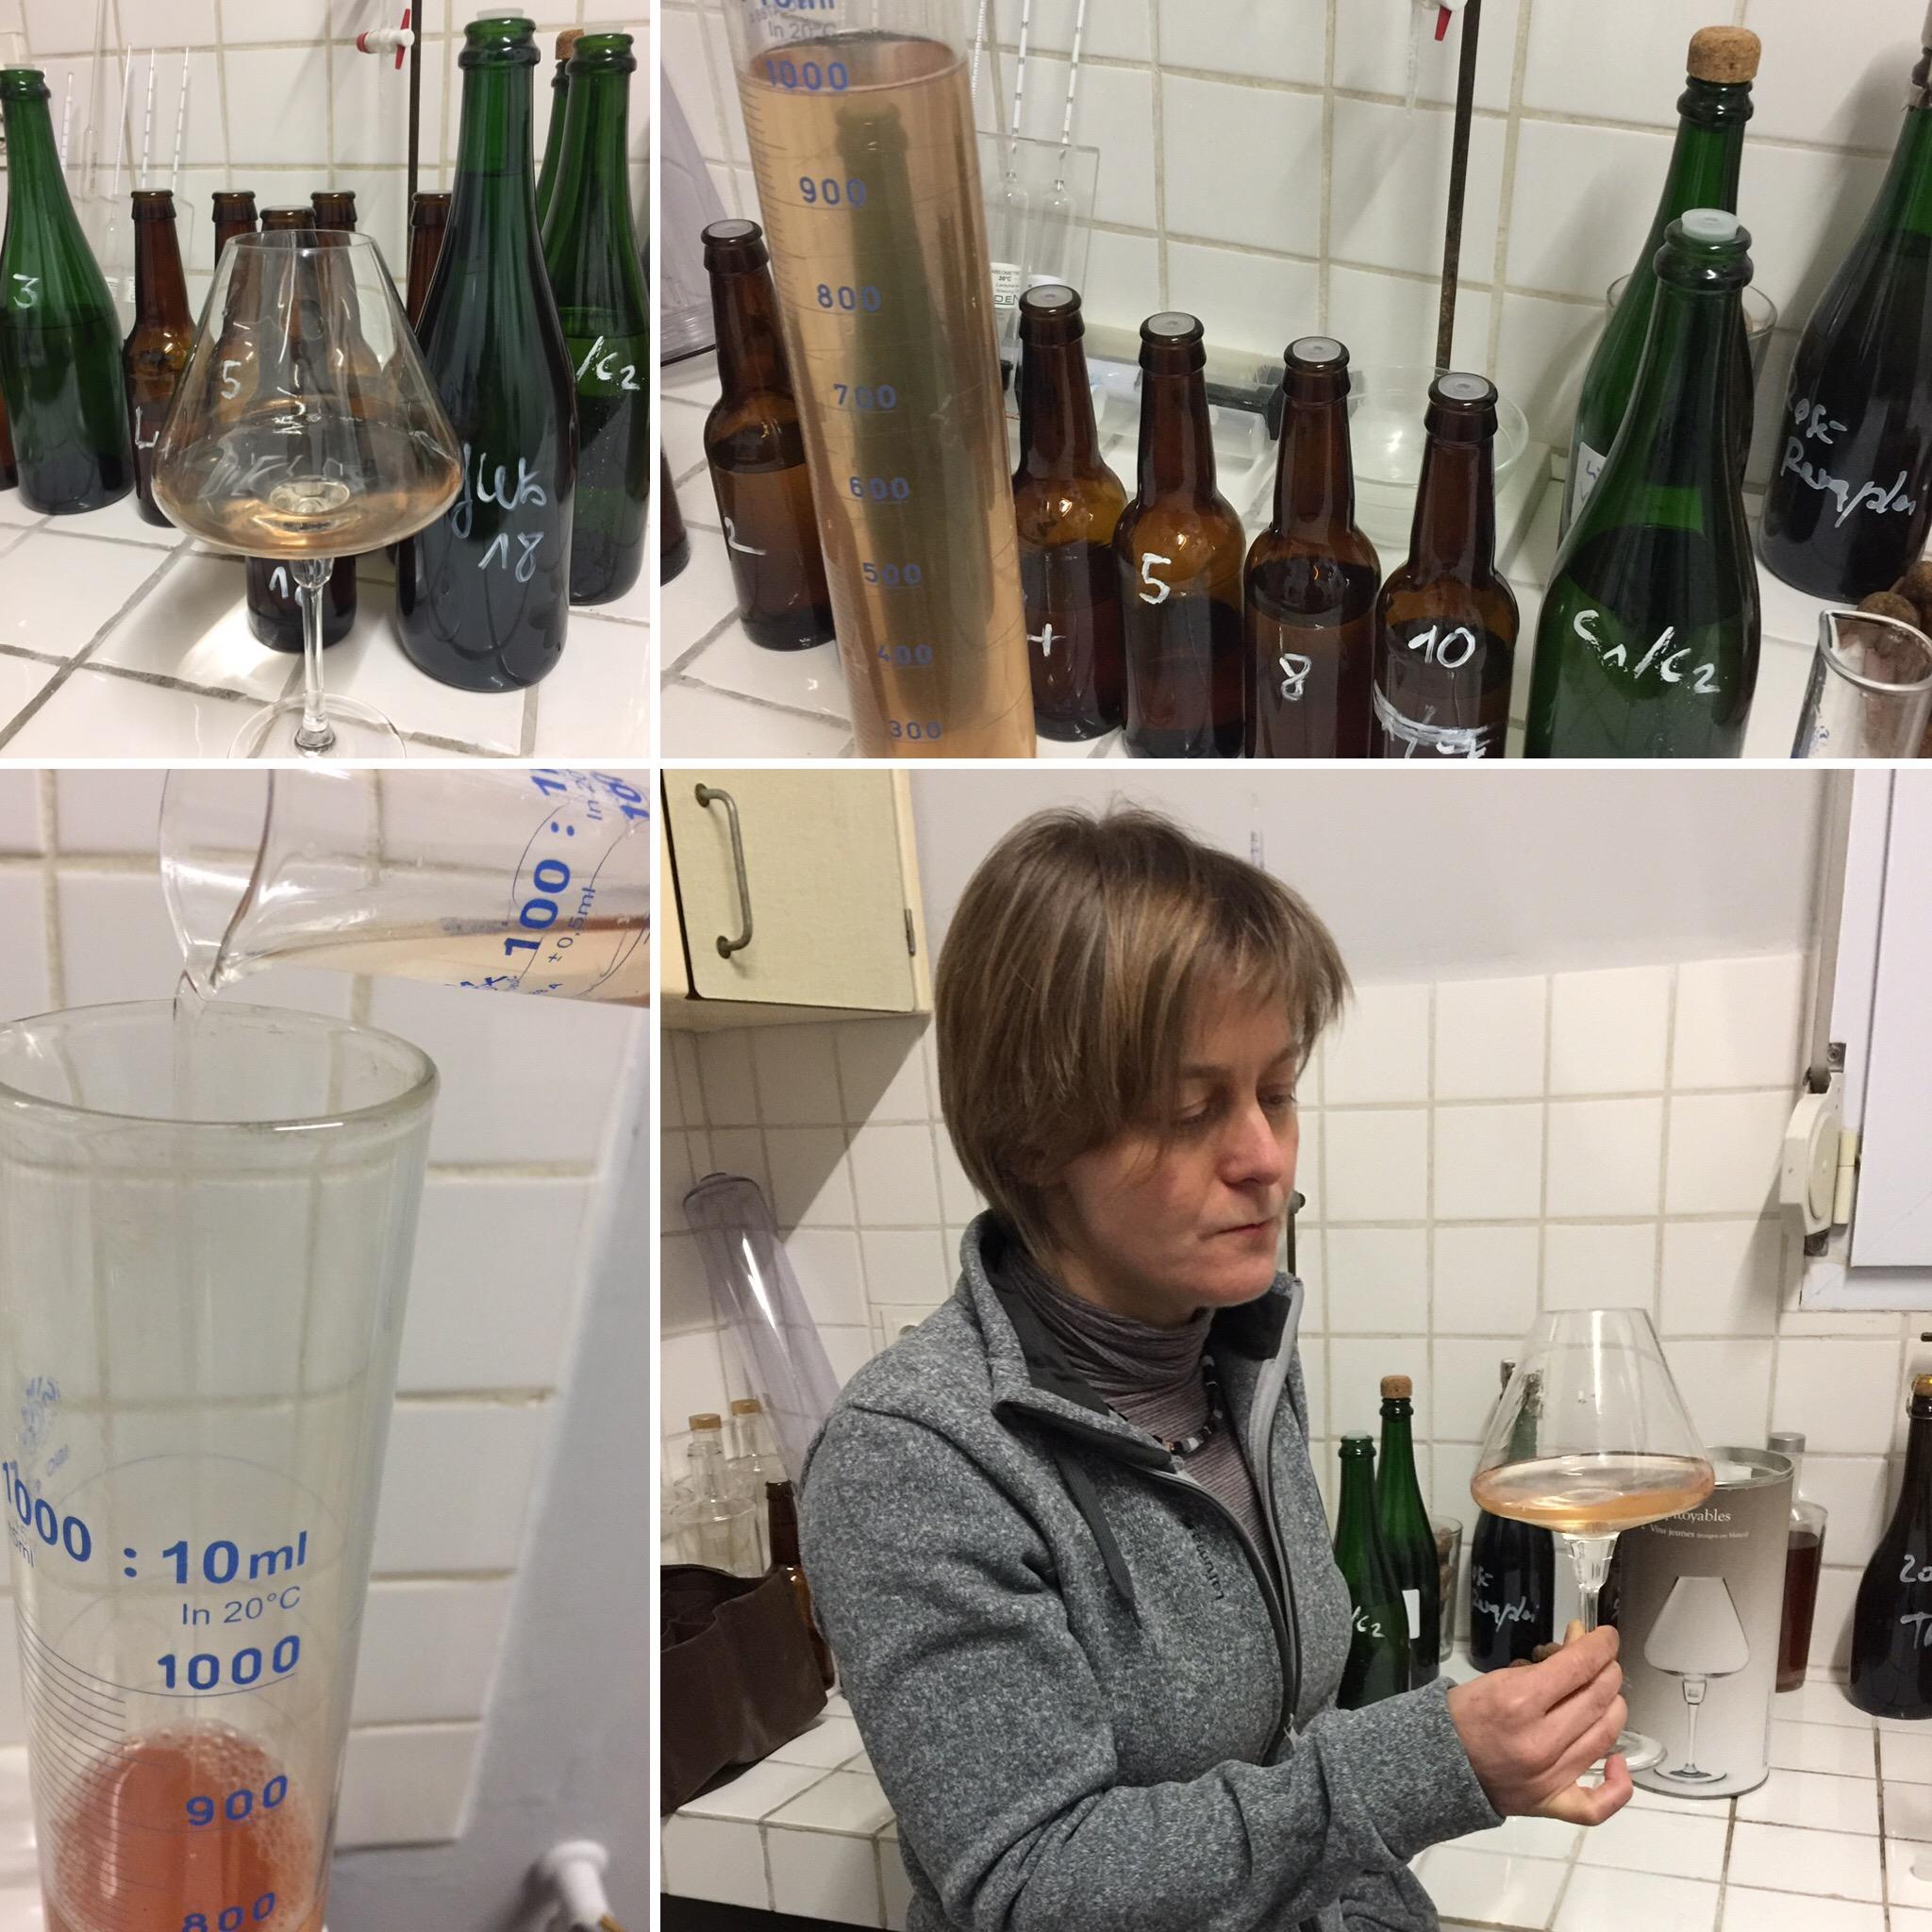 Assemblage Oenologie Dégustation Champagne Vin clair Virginie Vanpoperinghe